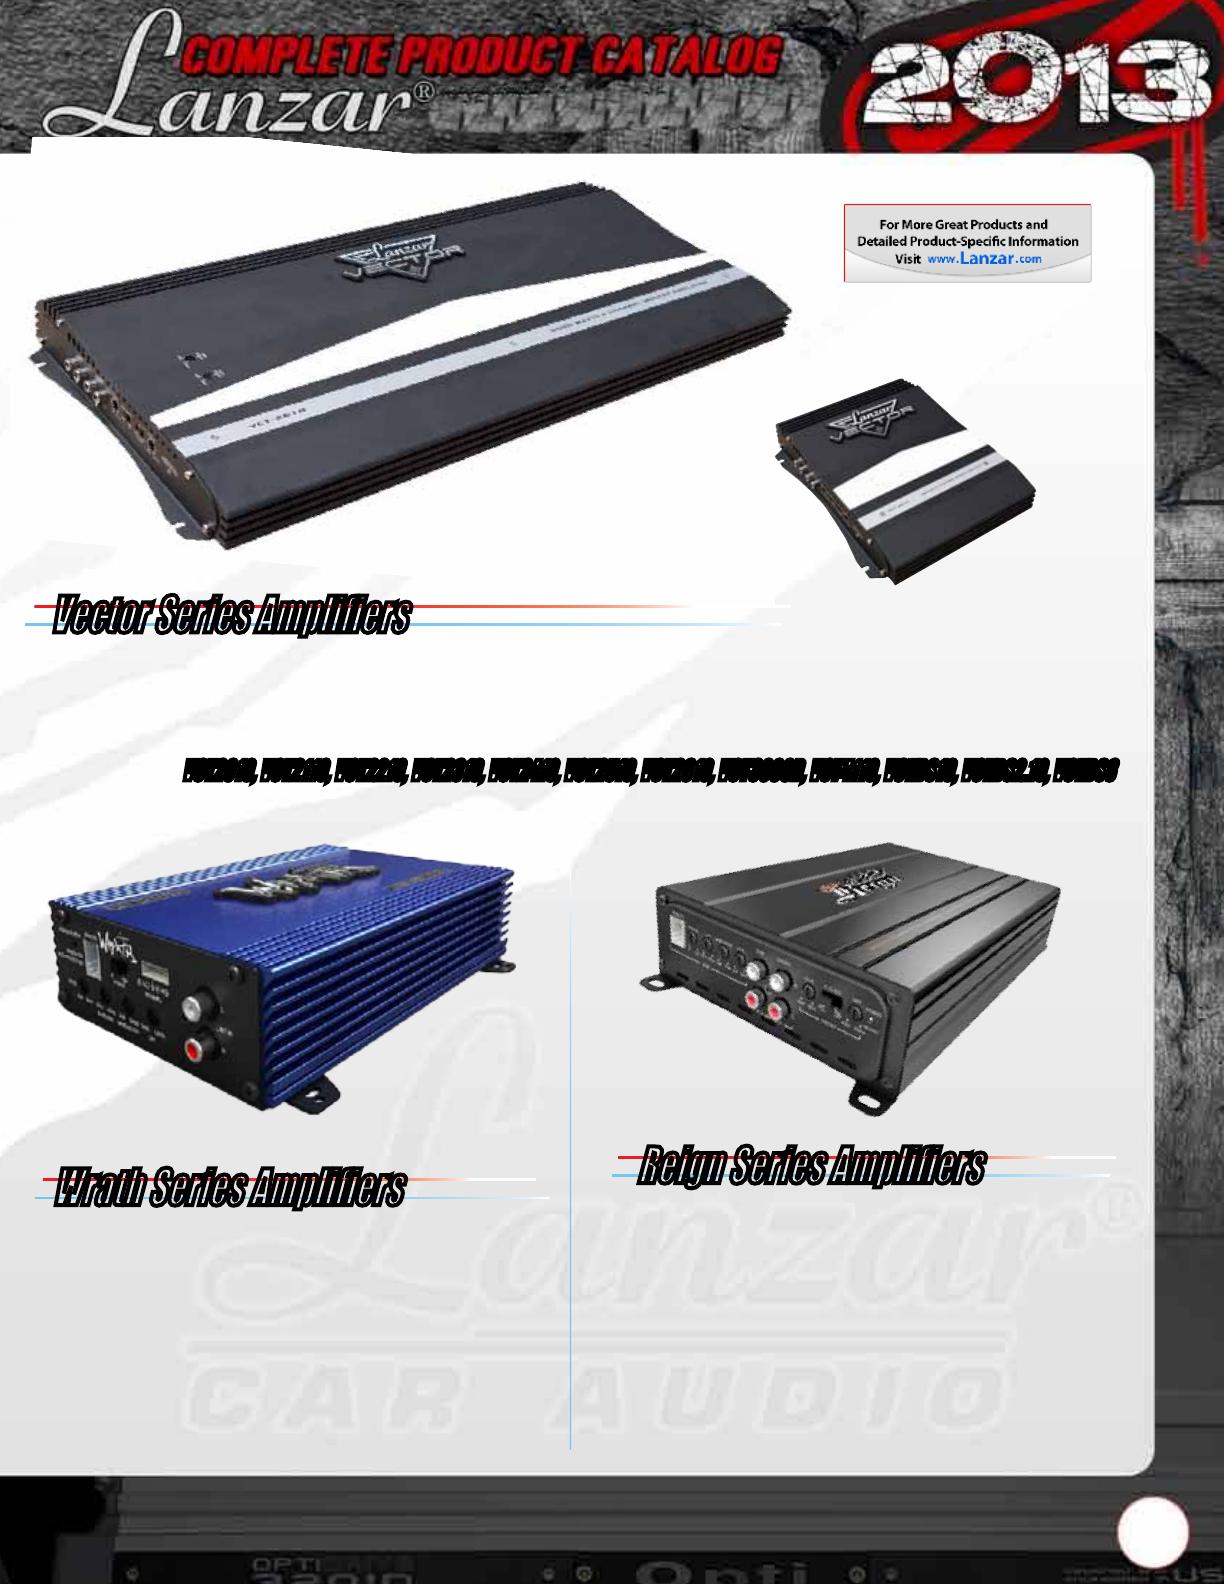 Lanzar Speakers Installation Instructions Max Mxa224 Catalog Ampkit4 4 Gauge Contaq Amplifier Wiring Kit Parts Vector Series Amplifiers